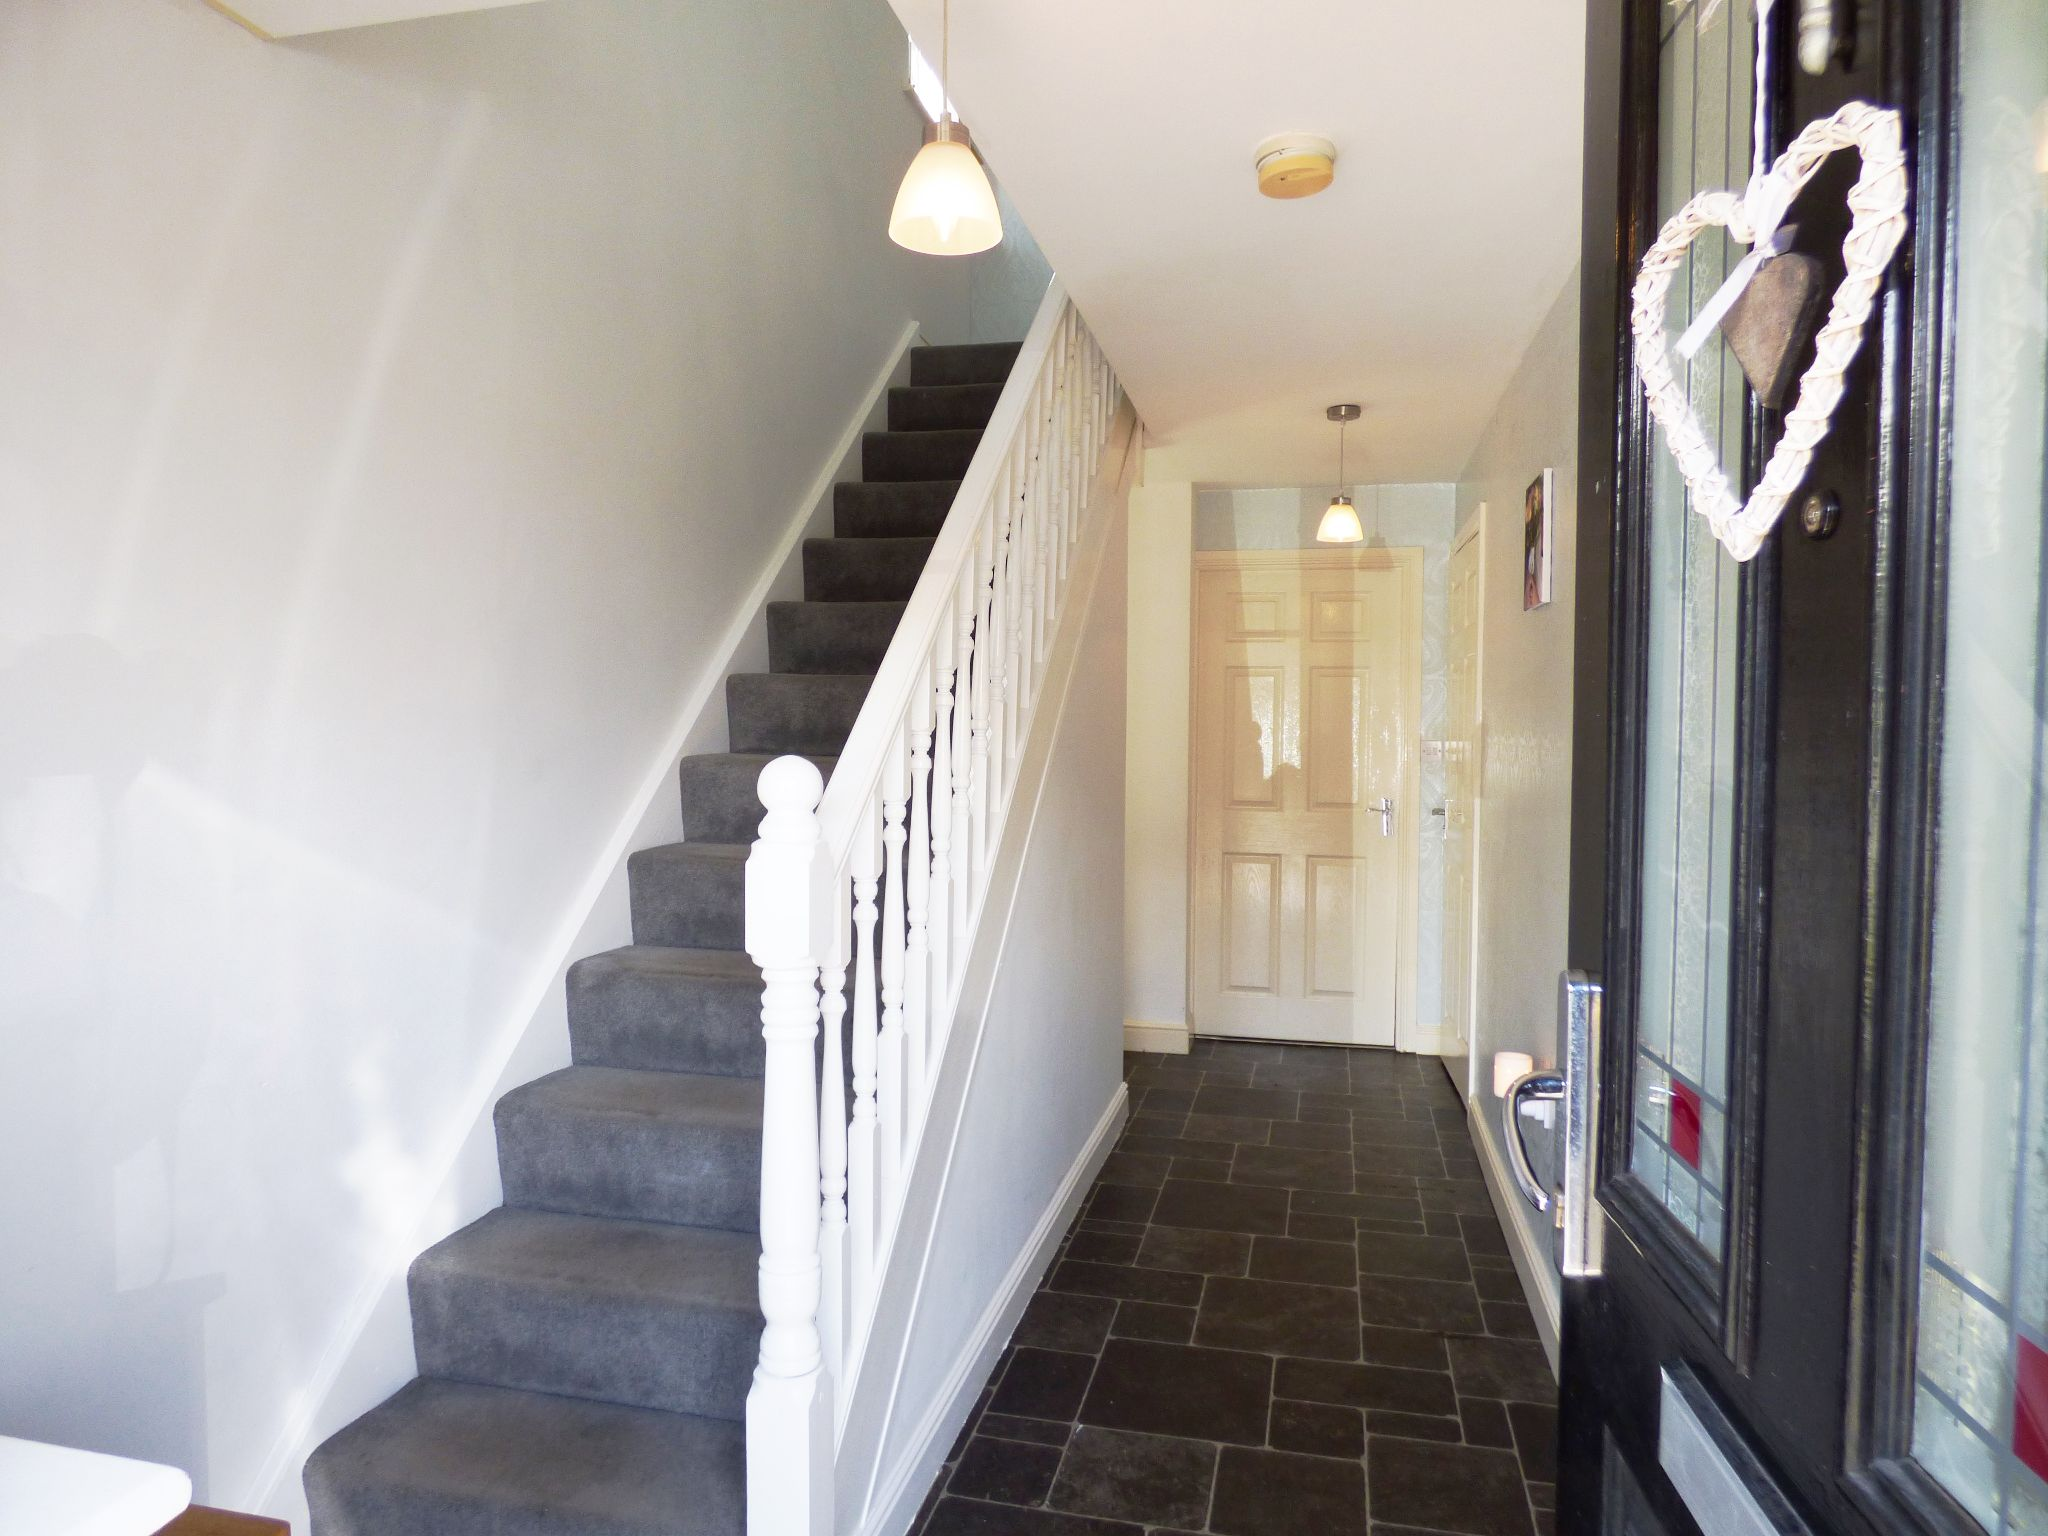 4 Bedroom Semi-detached House For Sale - Hallway